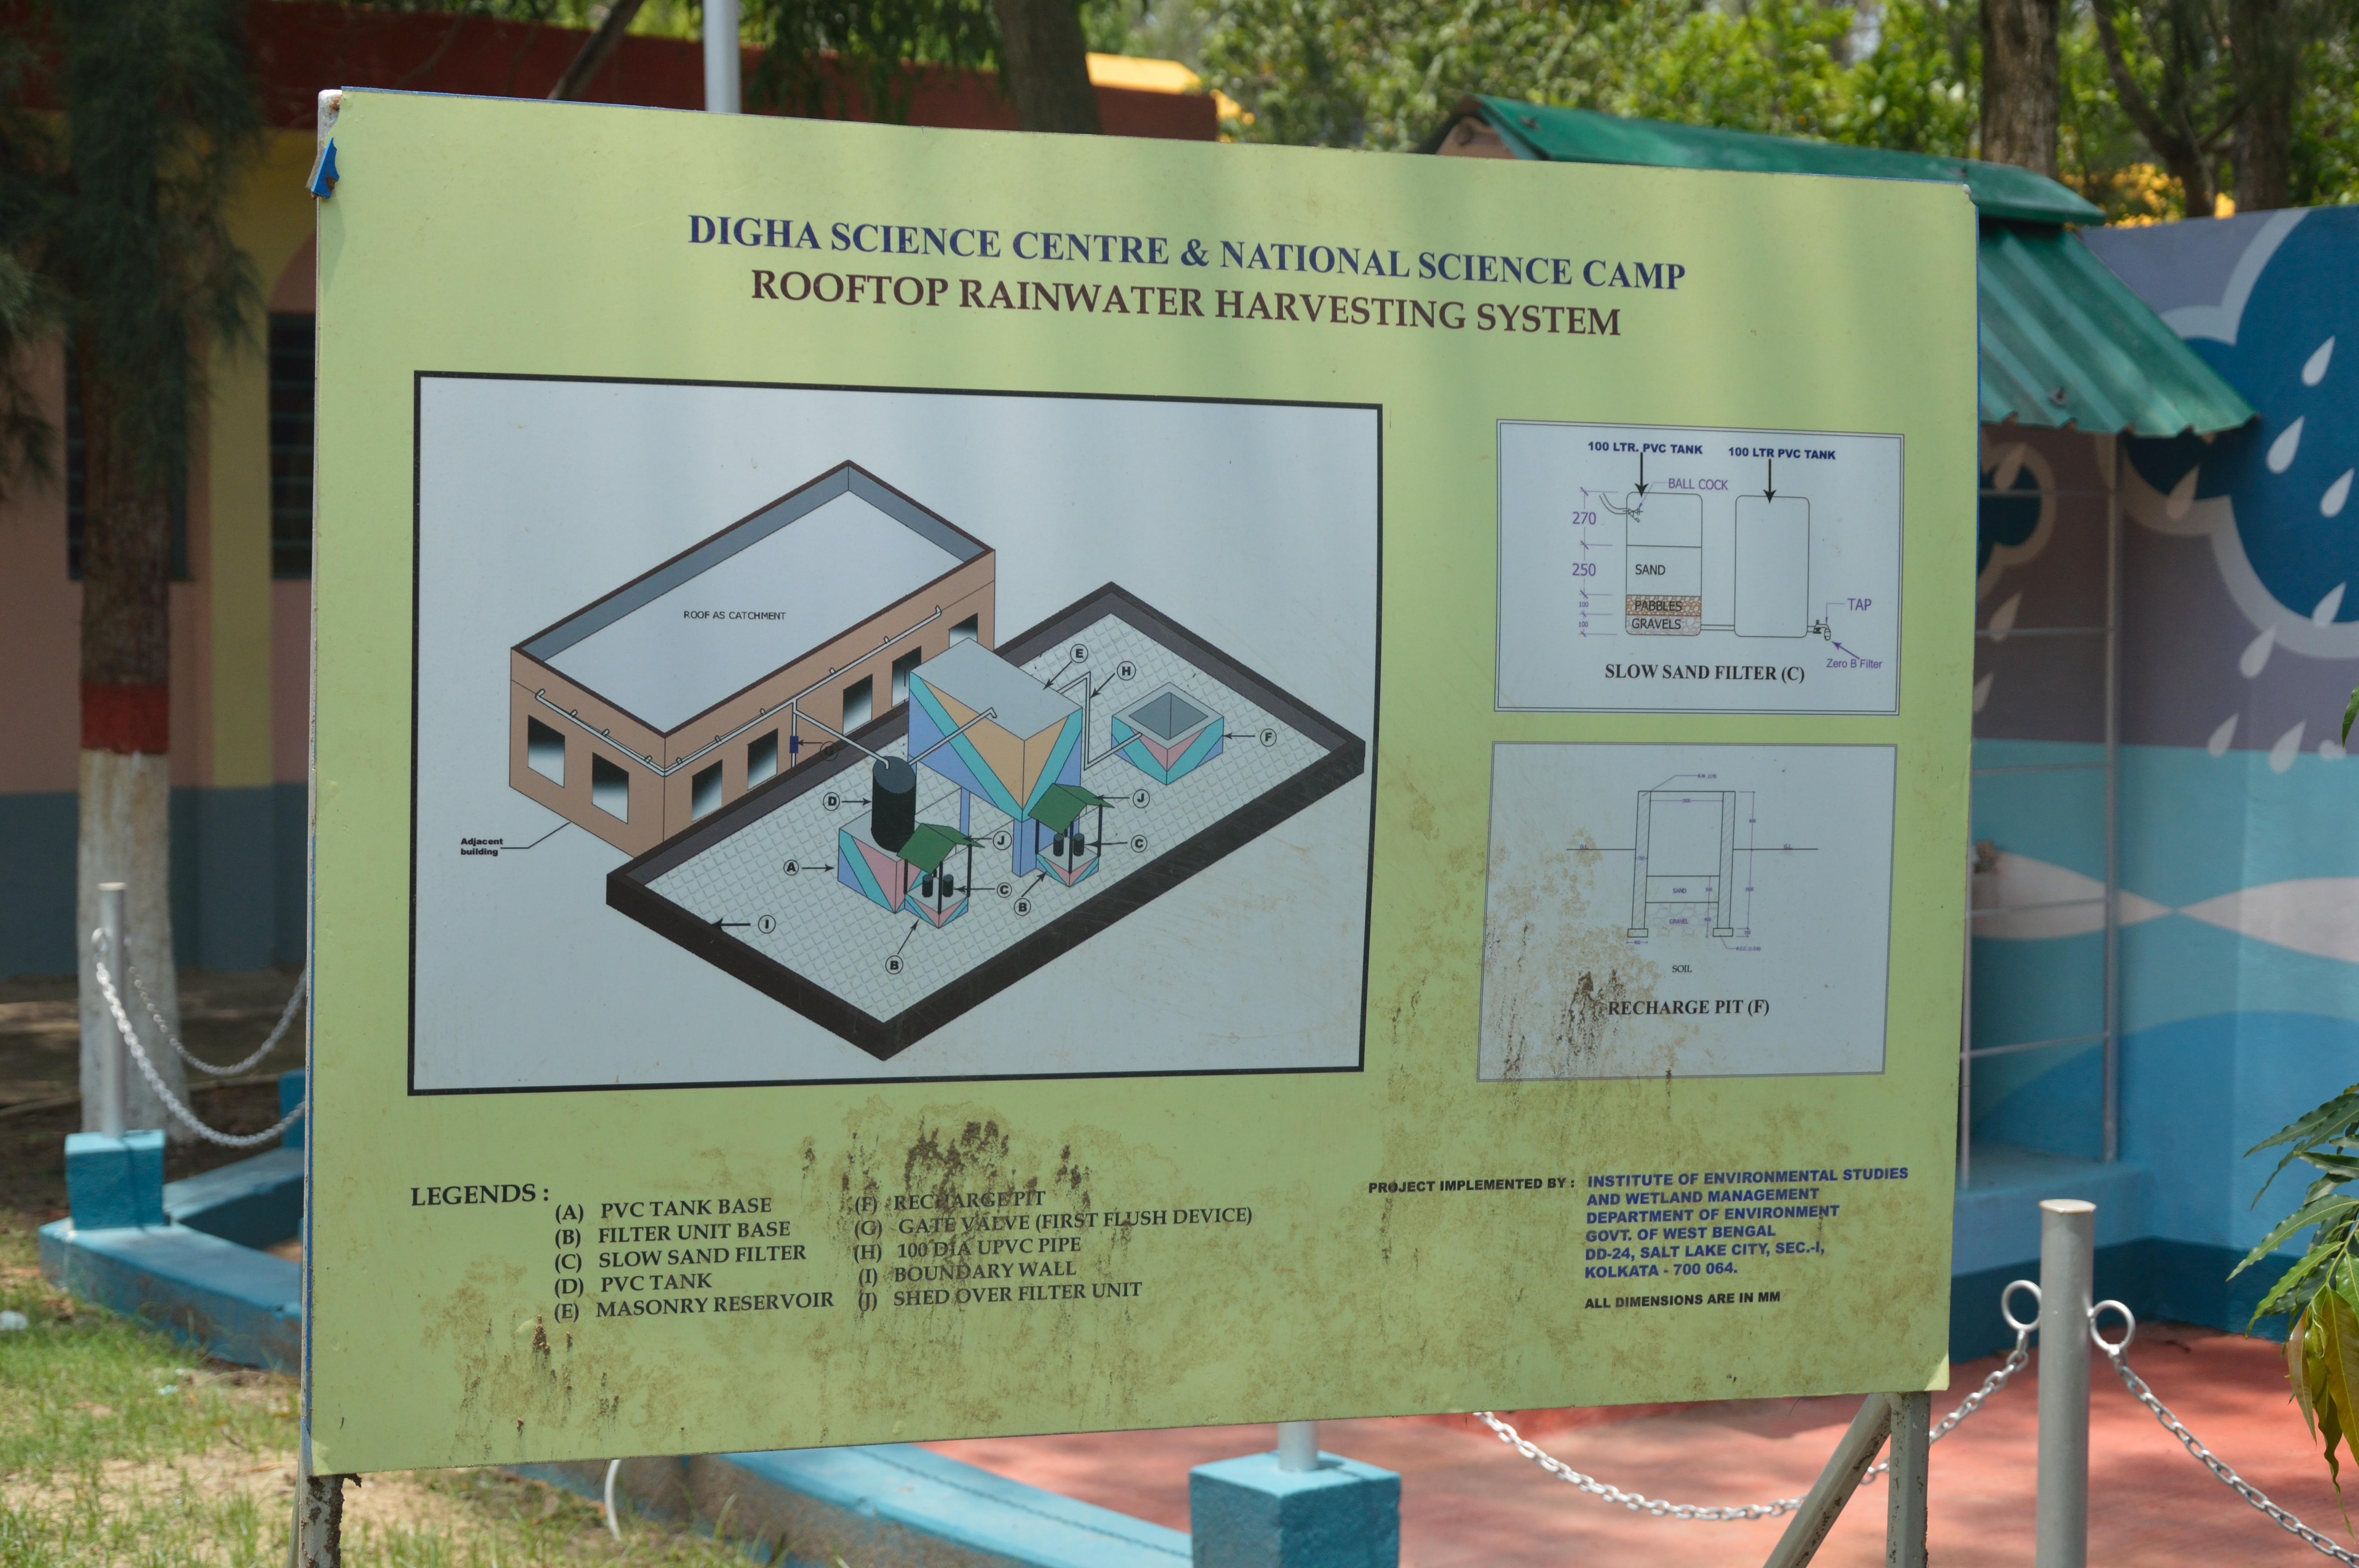 Description rainwater harvesting system jpg - File Signage Rooftop Rainwater Harvesting System Digha Science Centre New Digha